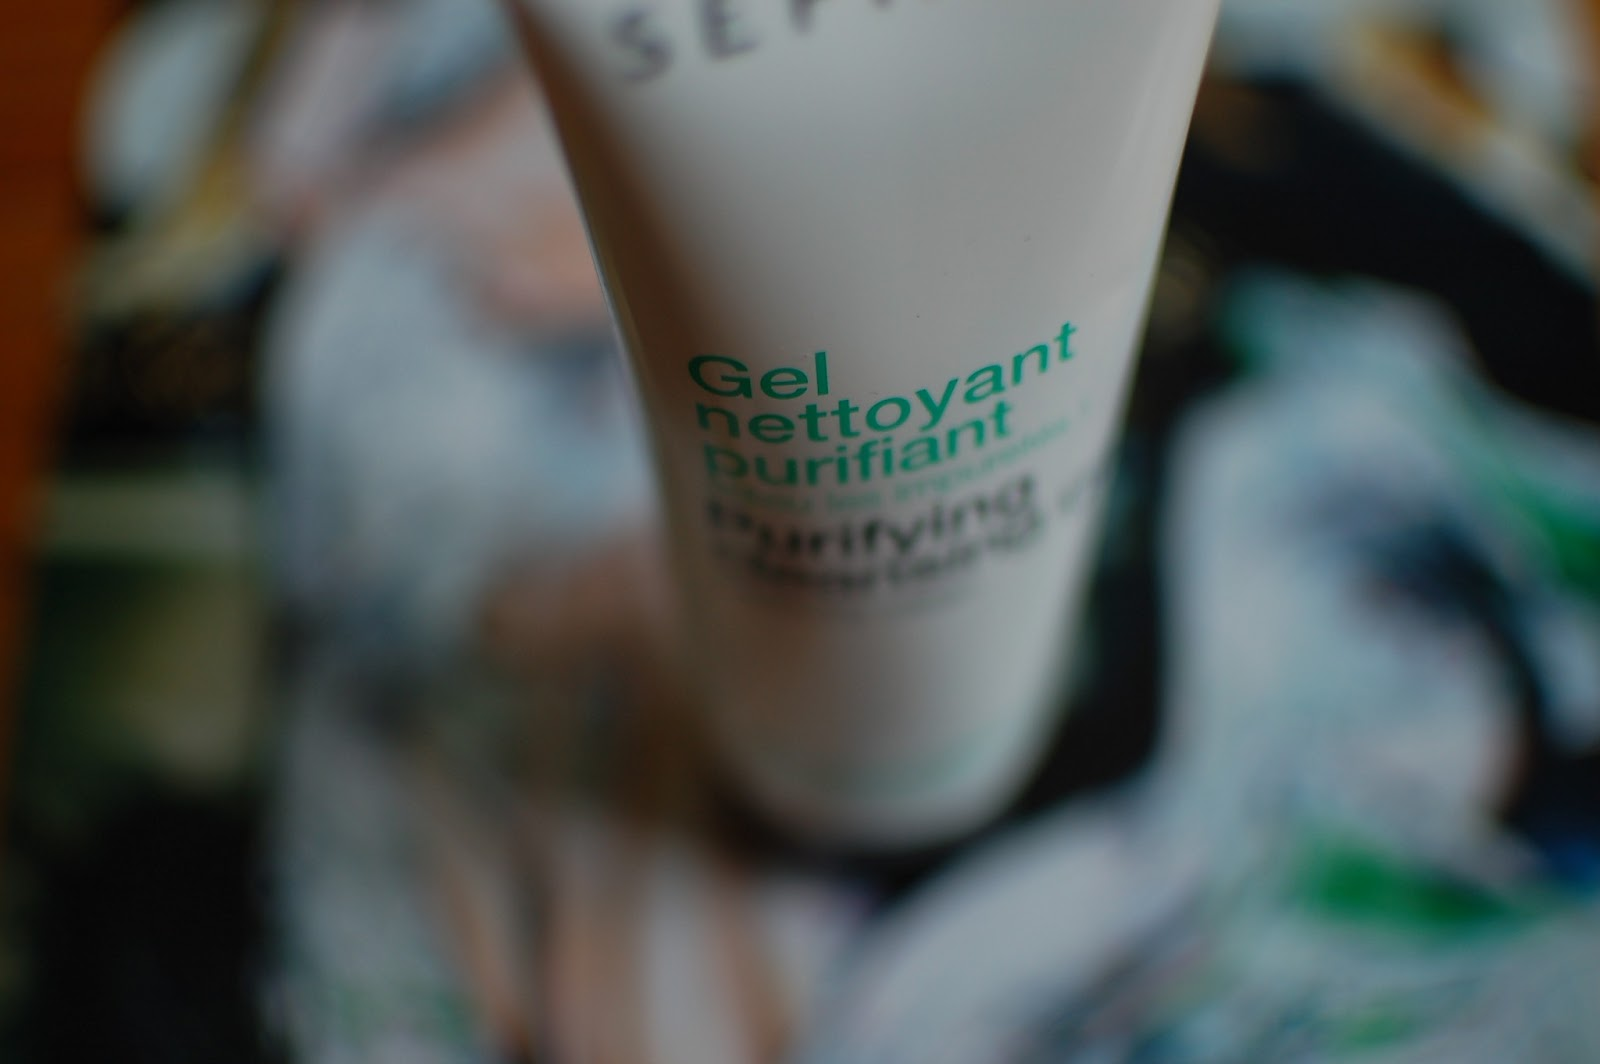 gel nettoyant purifiant-sephora-soin-visage